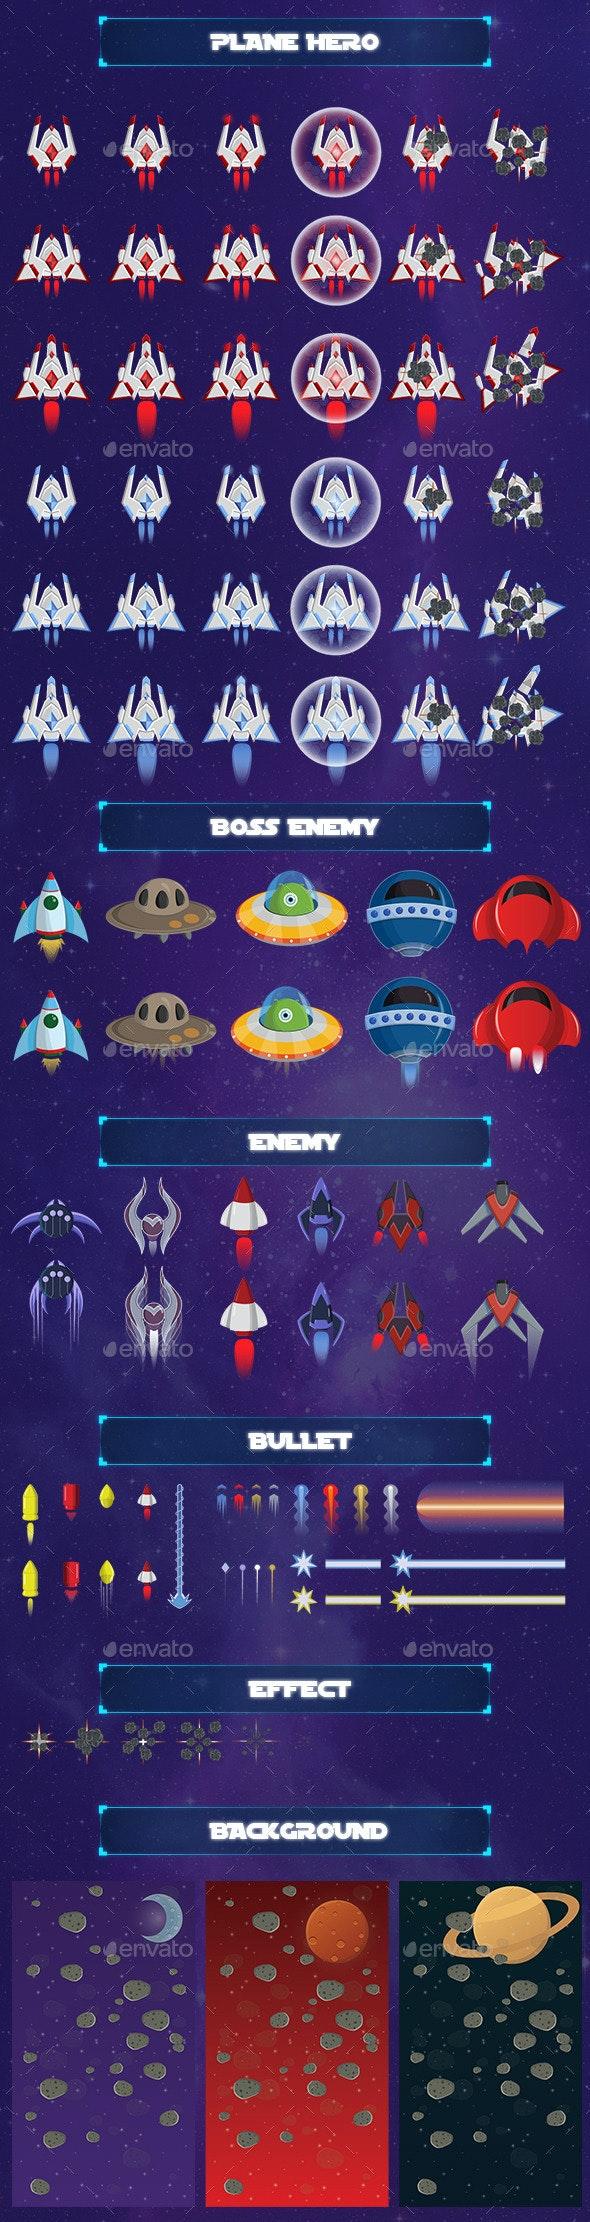 Game Asset - Galaxy Tuner - Game Kits Game Assets